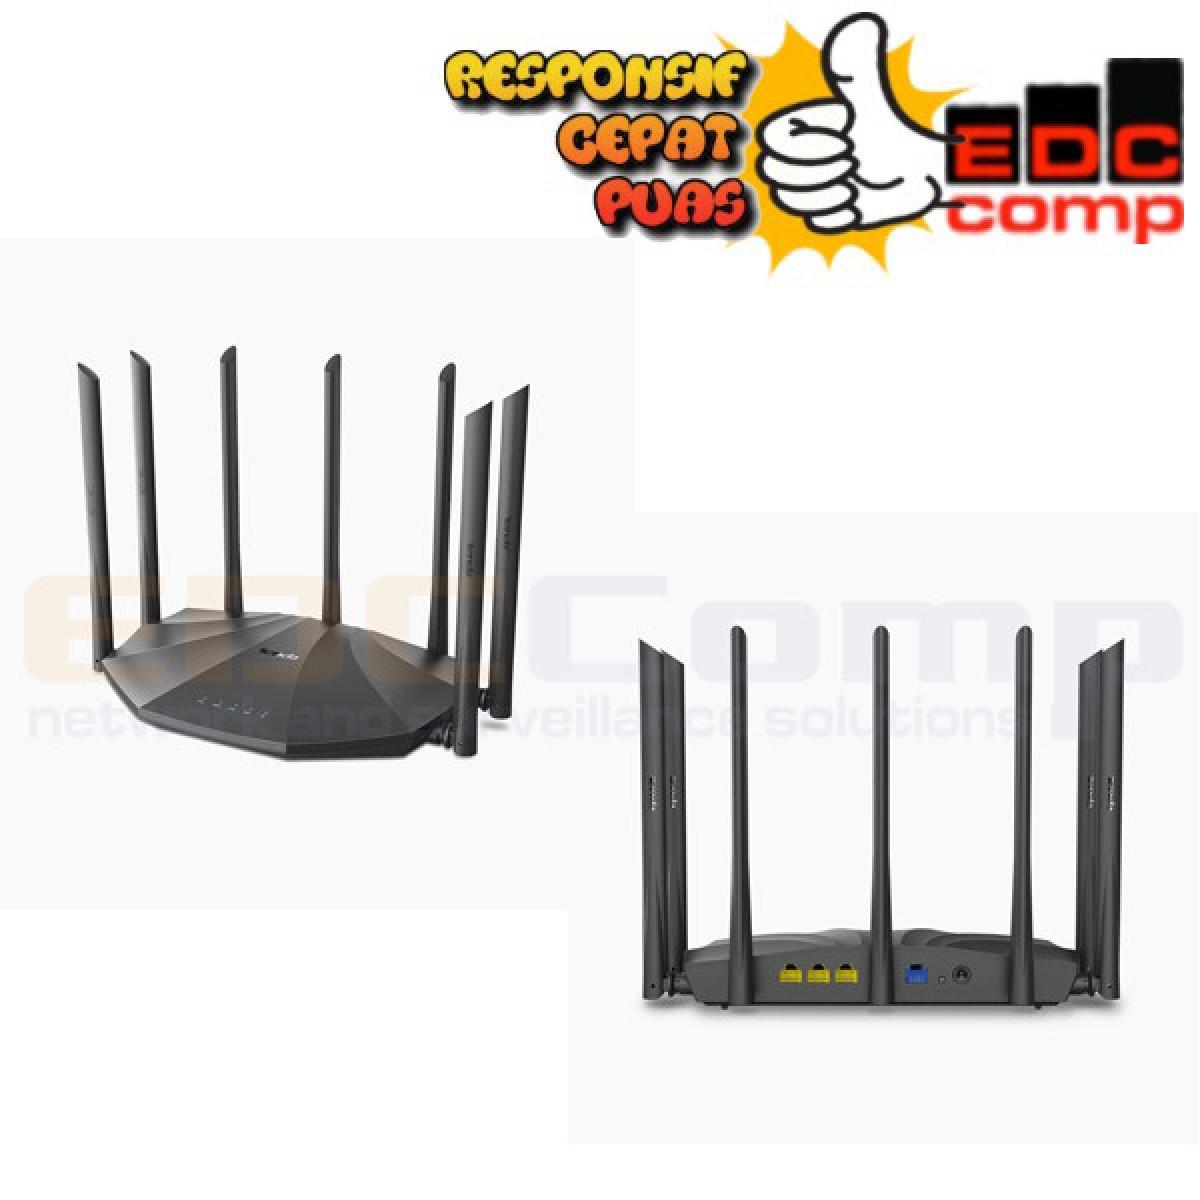 Wireless Router Dual Band Gigabit WiFi Router Tenda AC23 - EdcComp